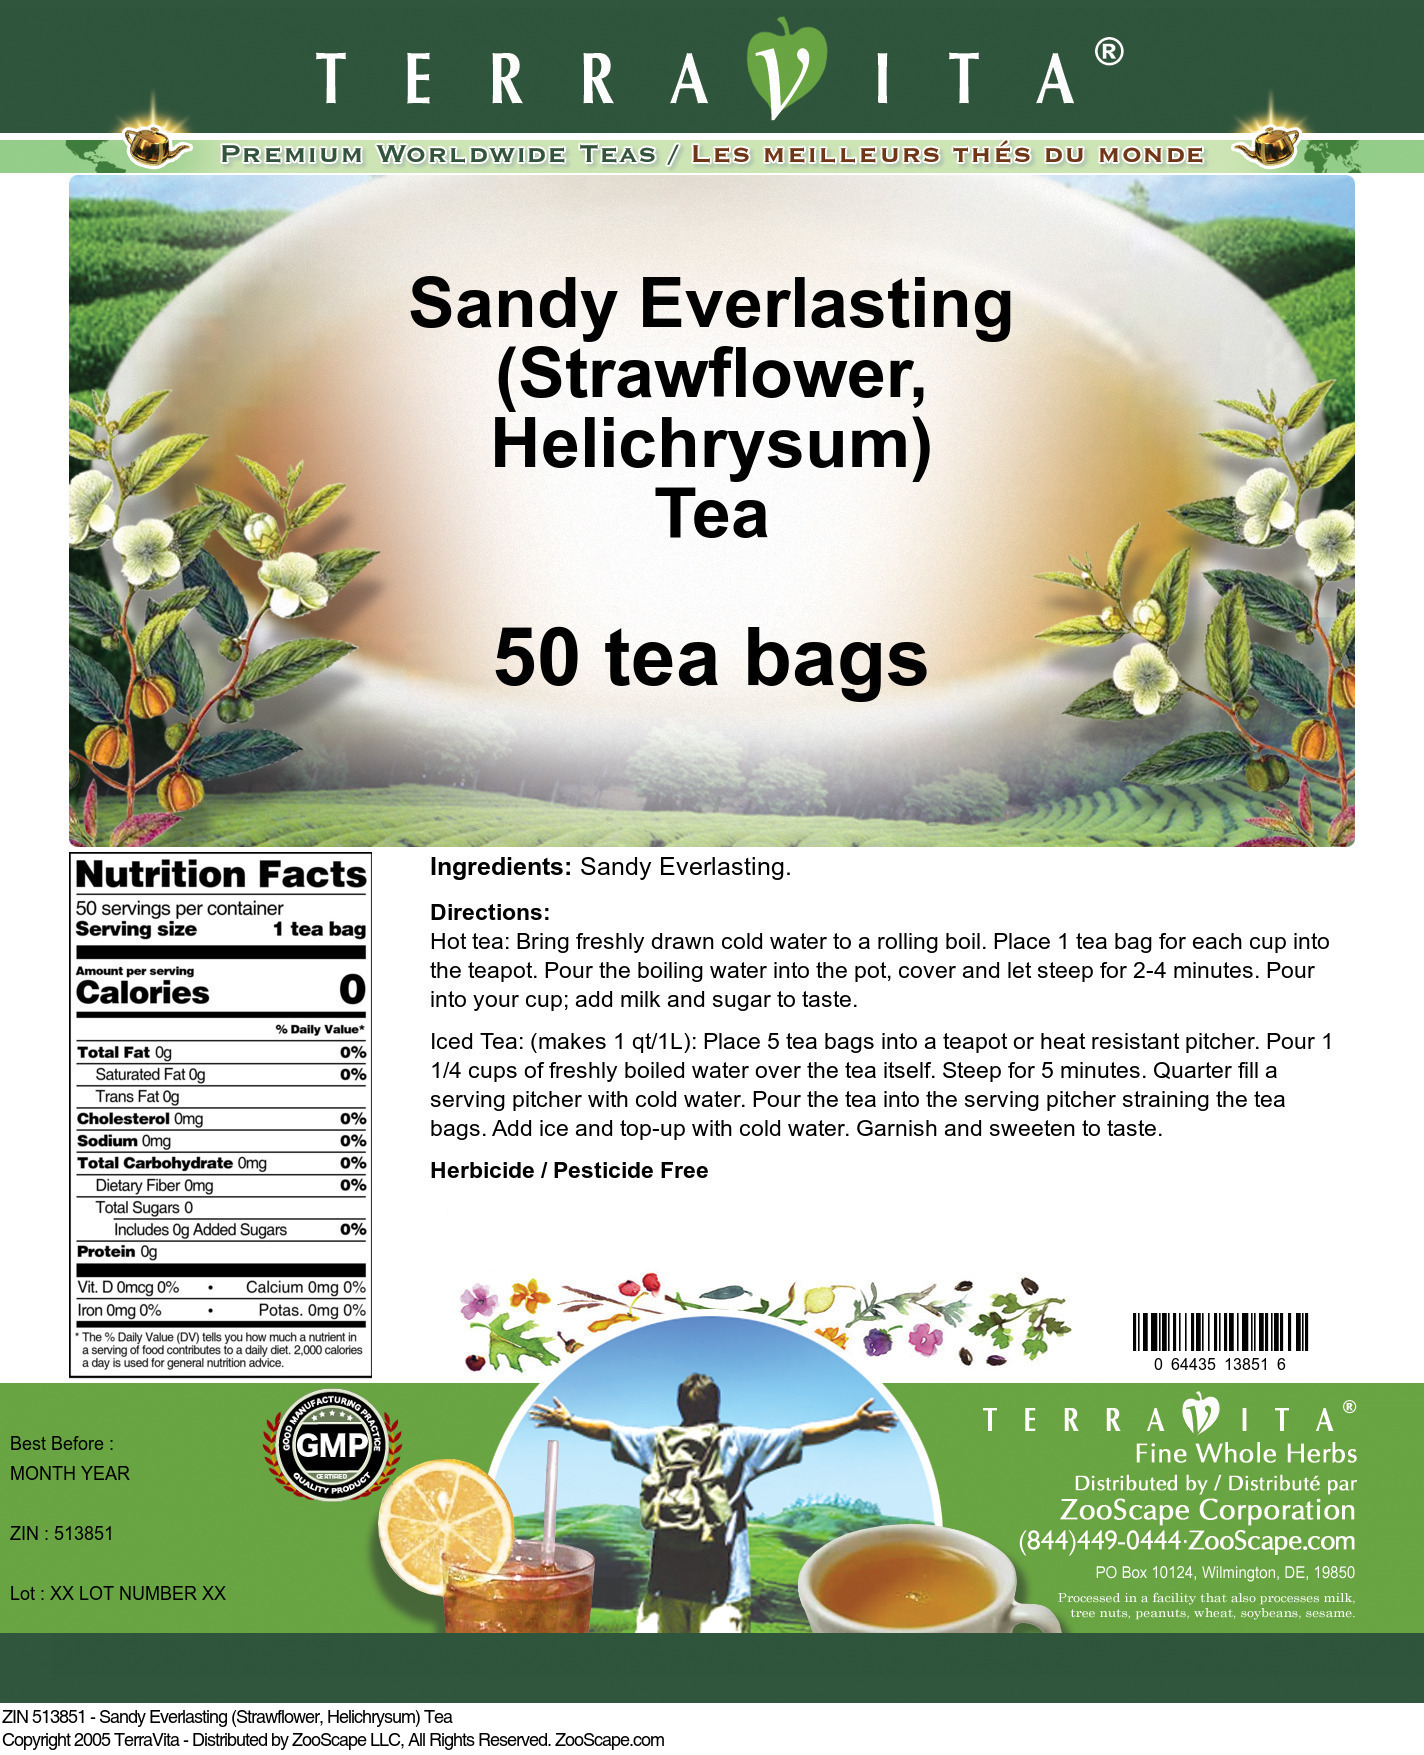 Sandy Everlasting (Strawflower, Helichrysum) Tea